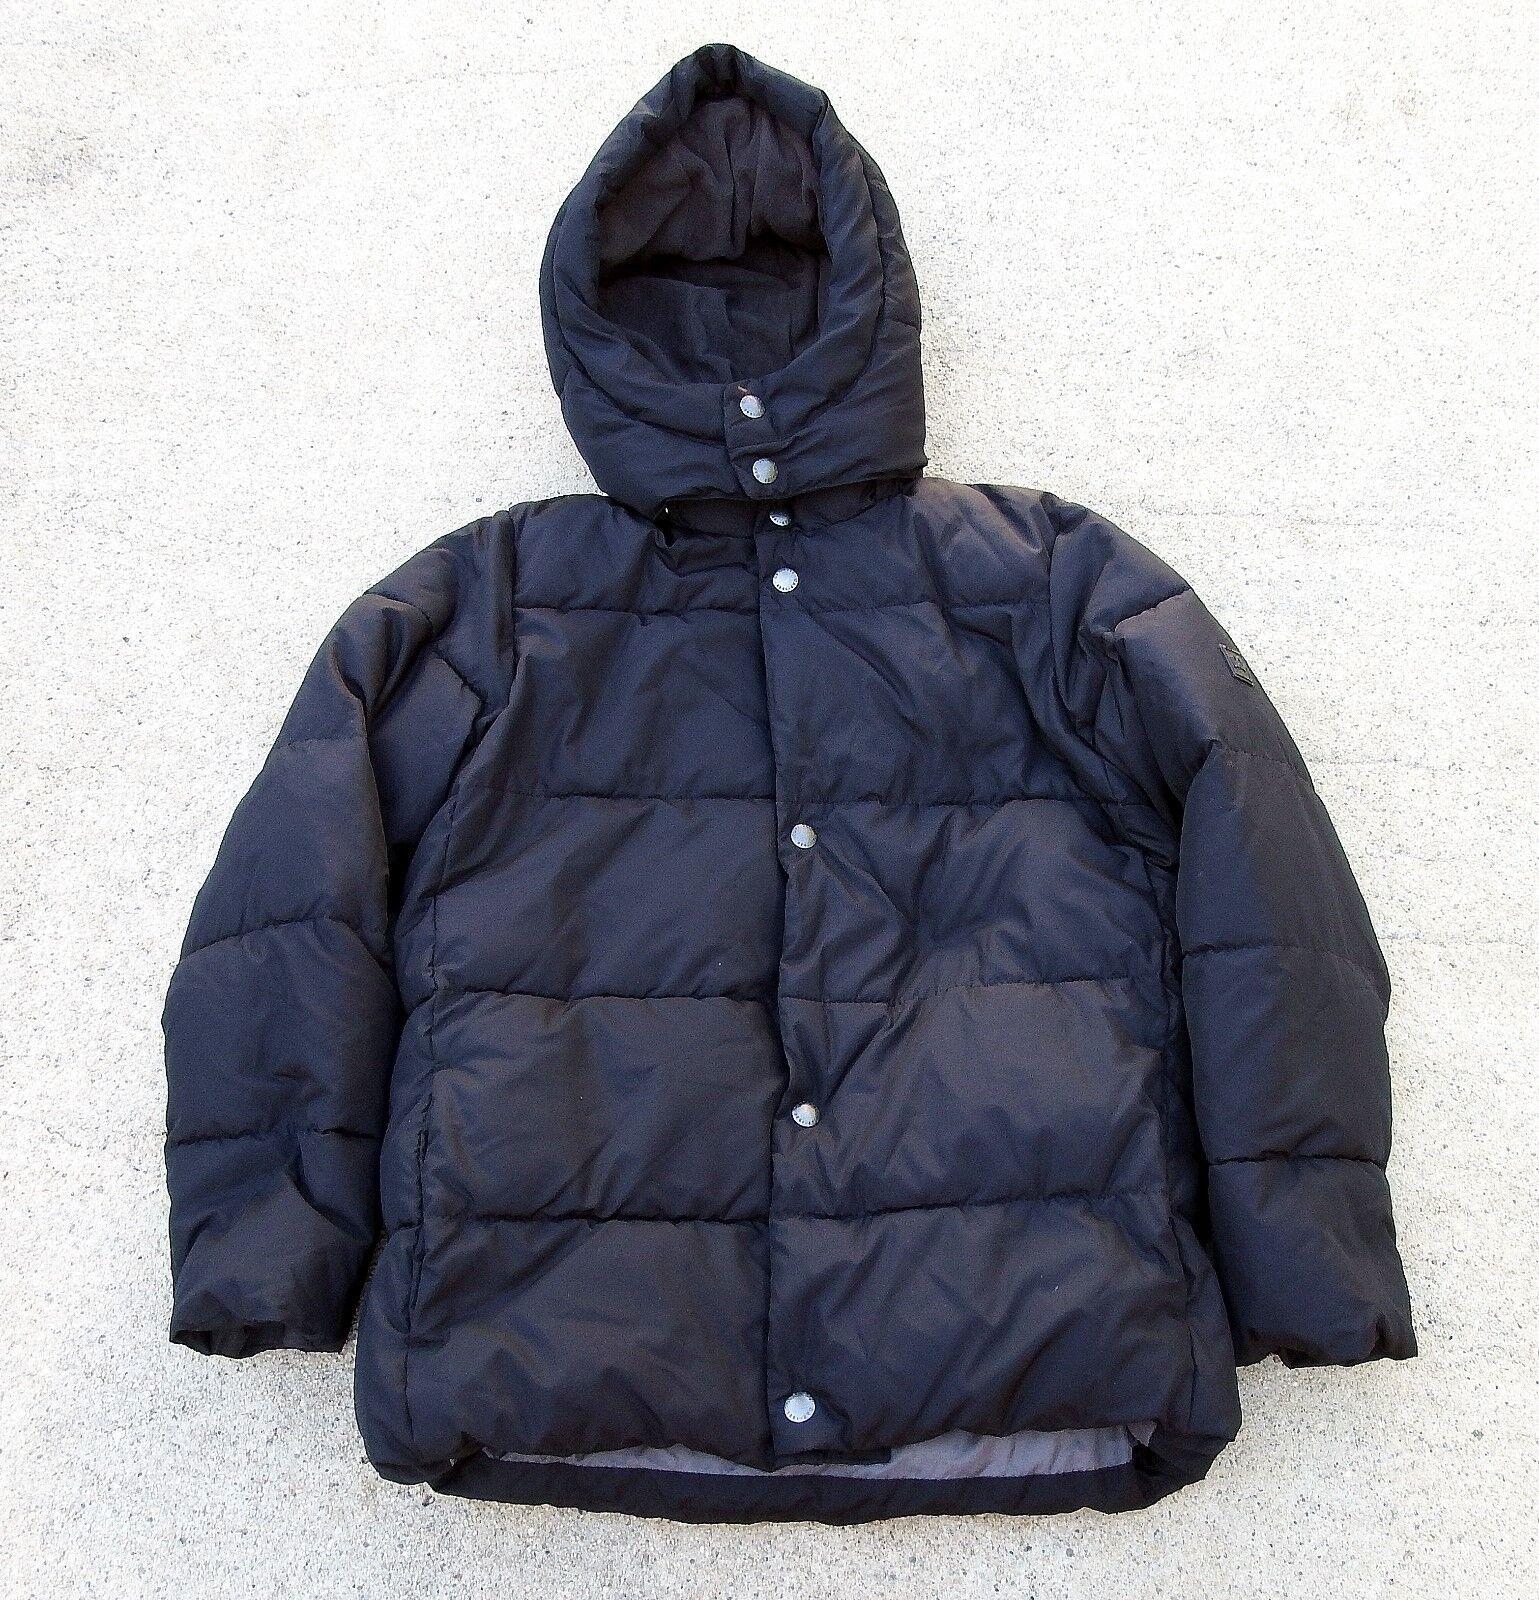 NWT!GAP KIDS Black Primaloft Jacket ~ Größe 12 (XL) UVP 108 $ ~ 1, - TAG KOSTENLOS